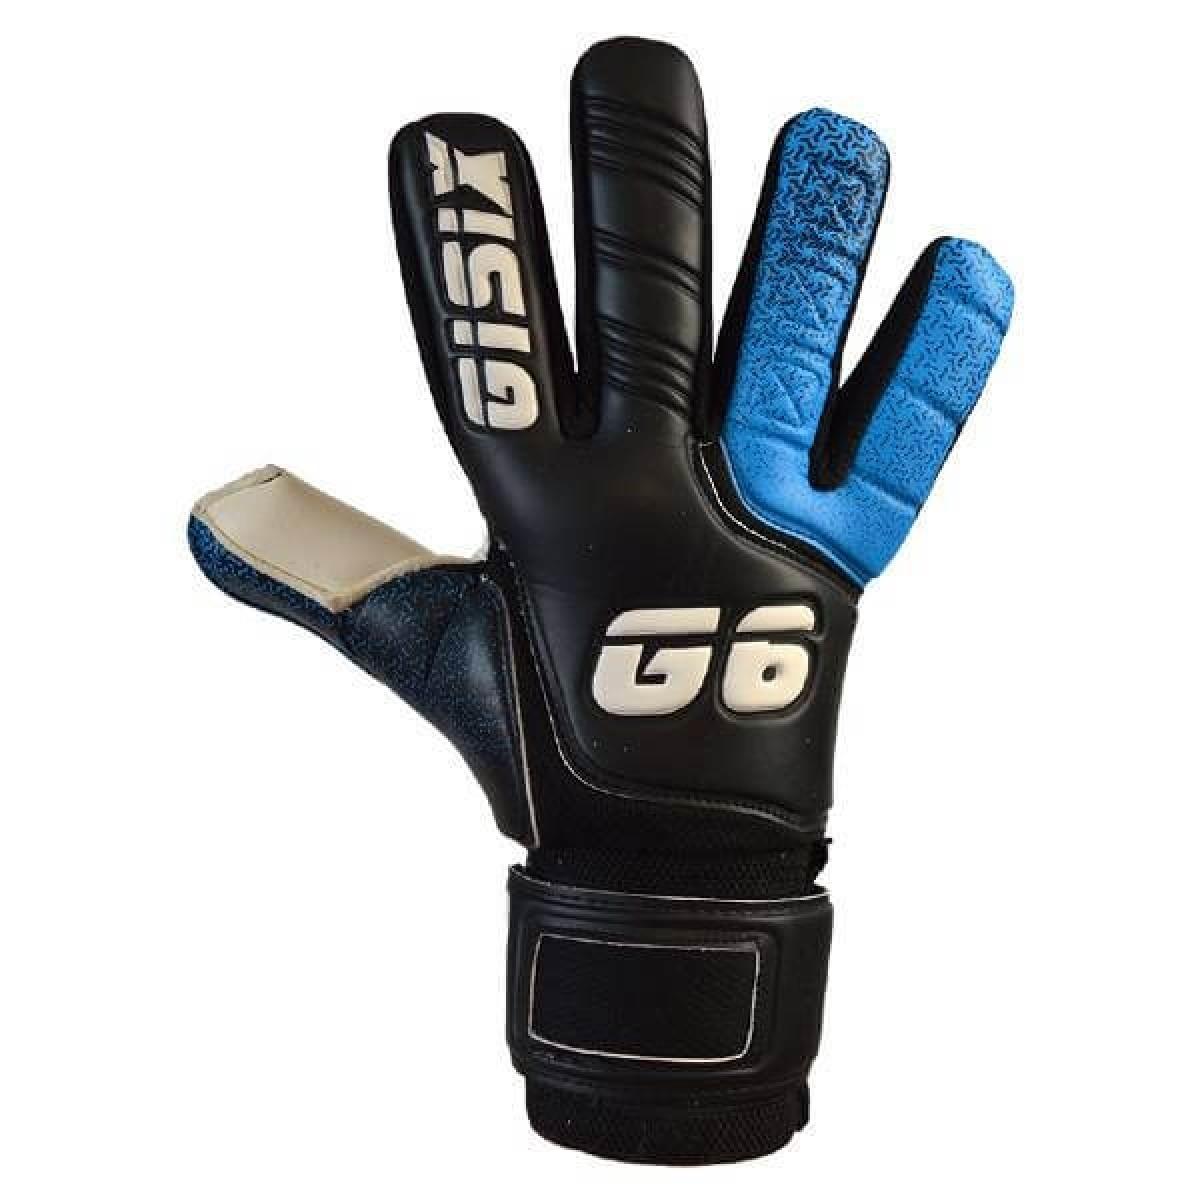 G6 G079 Cyan 1